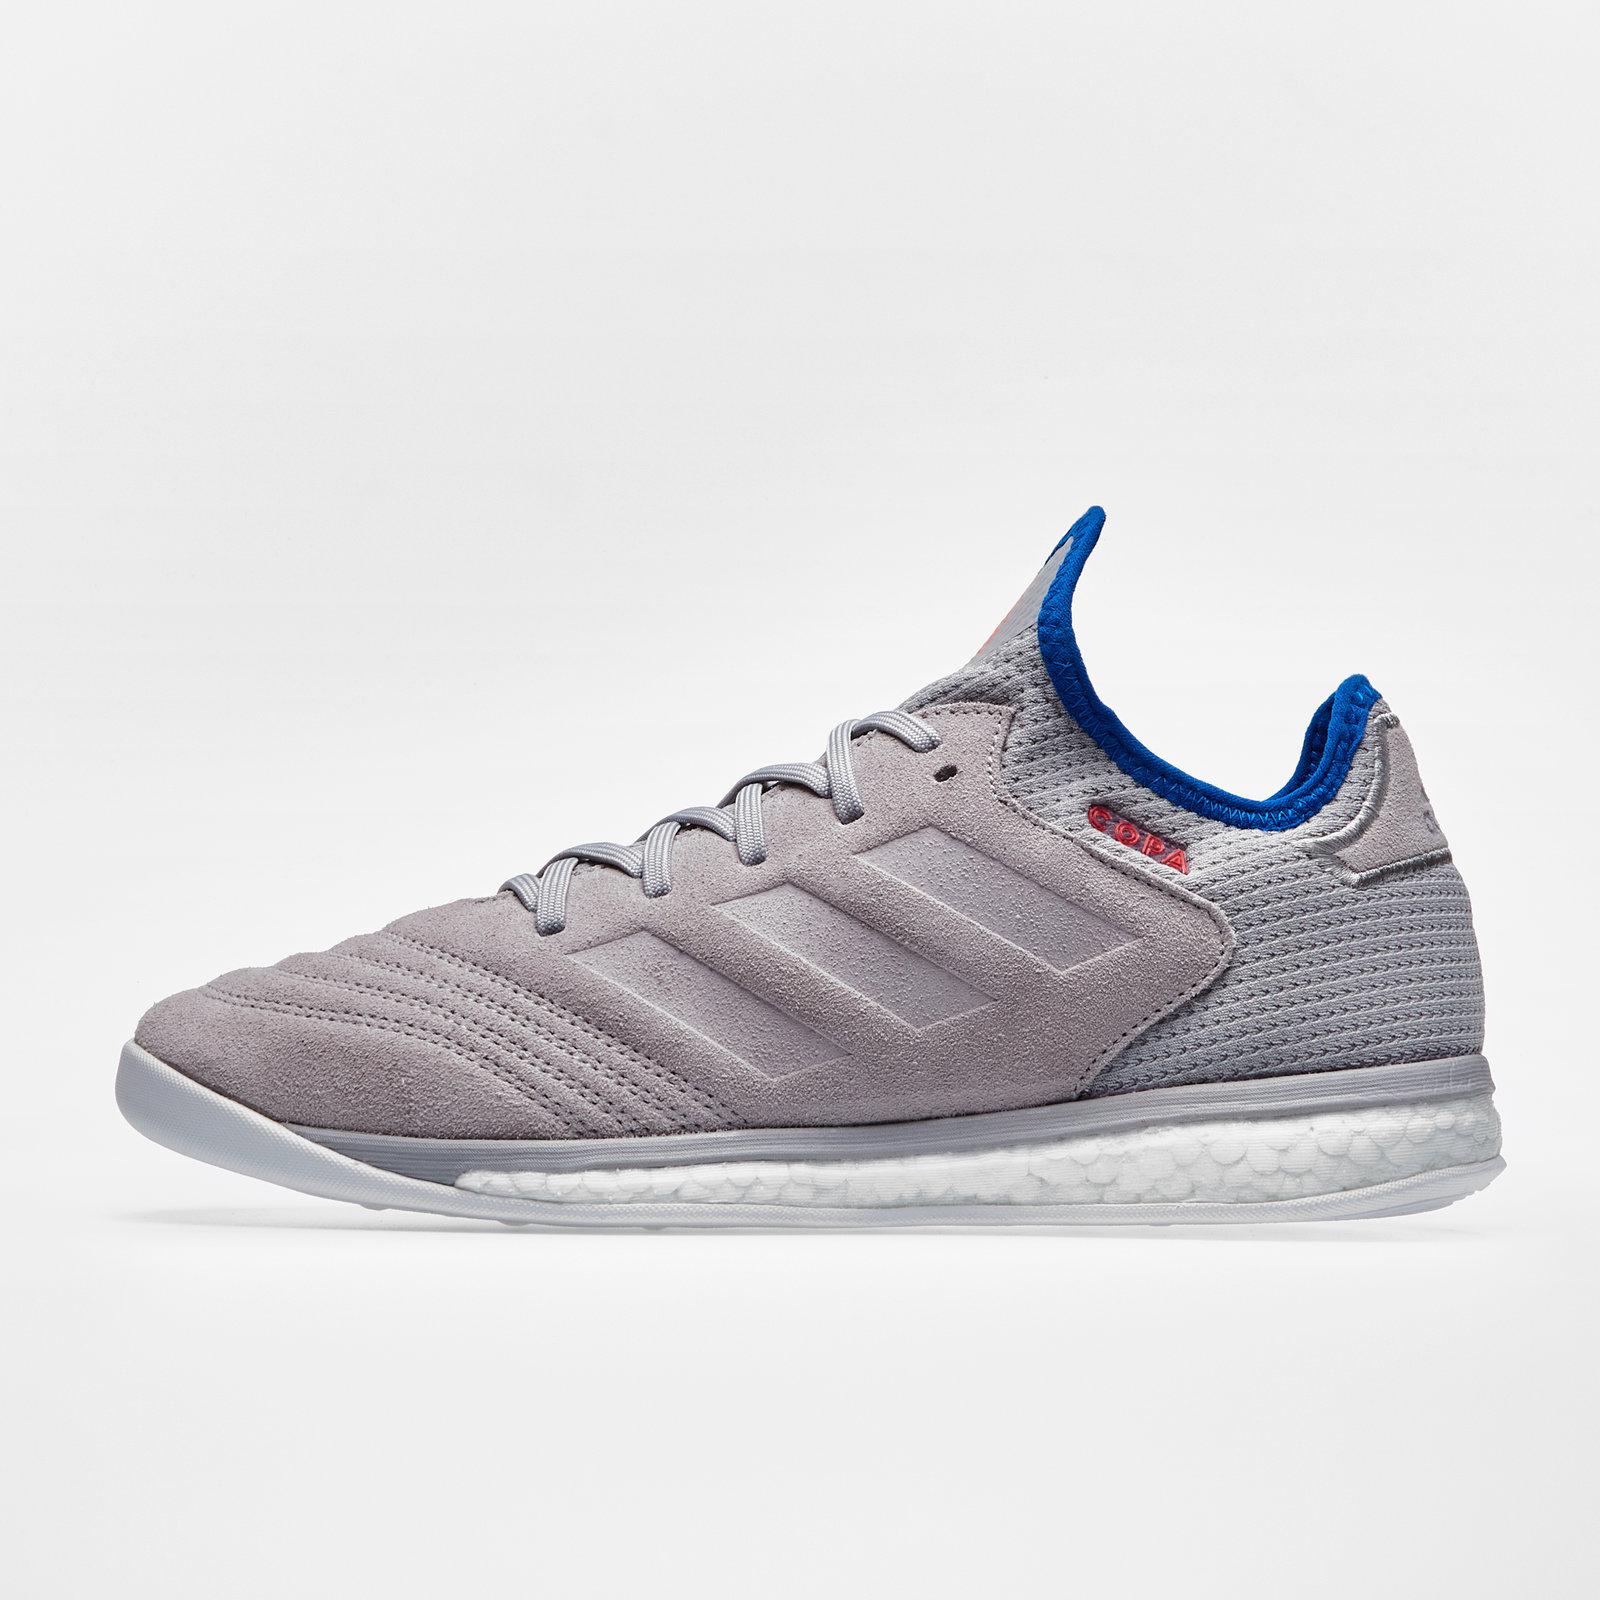 d7c8ea9b8 adidas Mens Copa Tango 18.1 Football Boots Studs Trainers Sports Shoes Grey